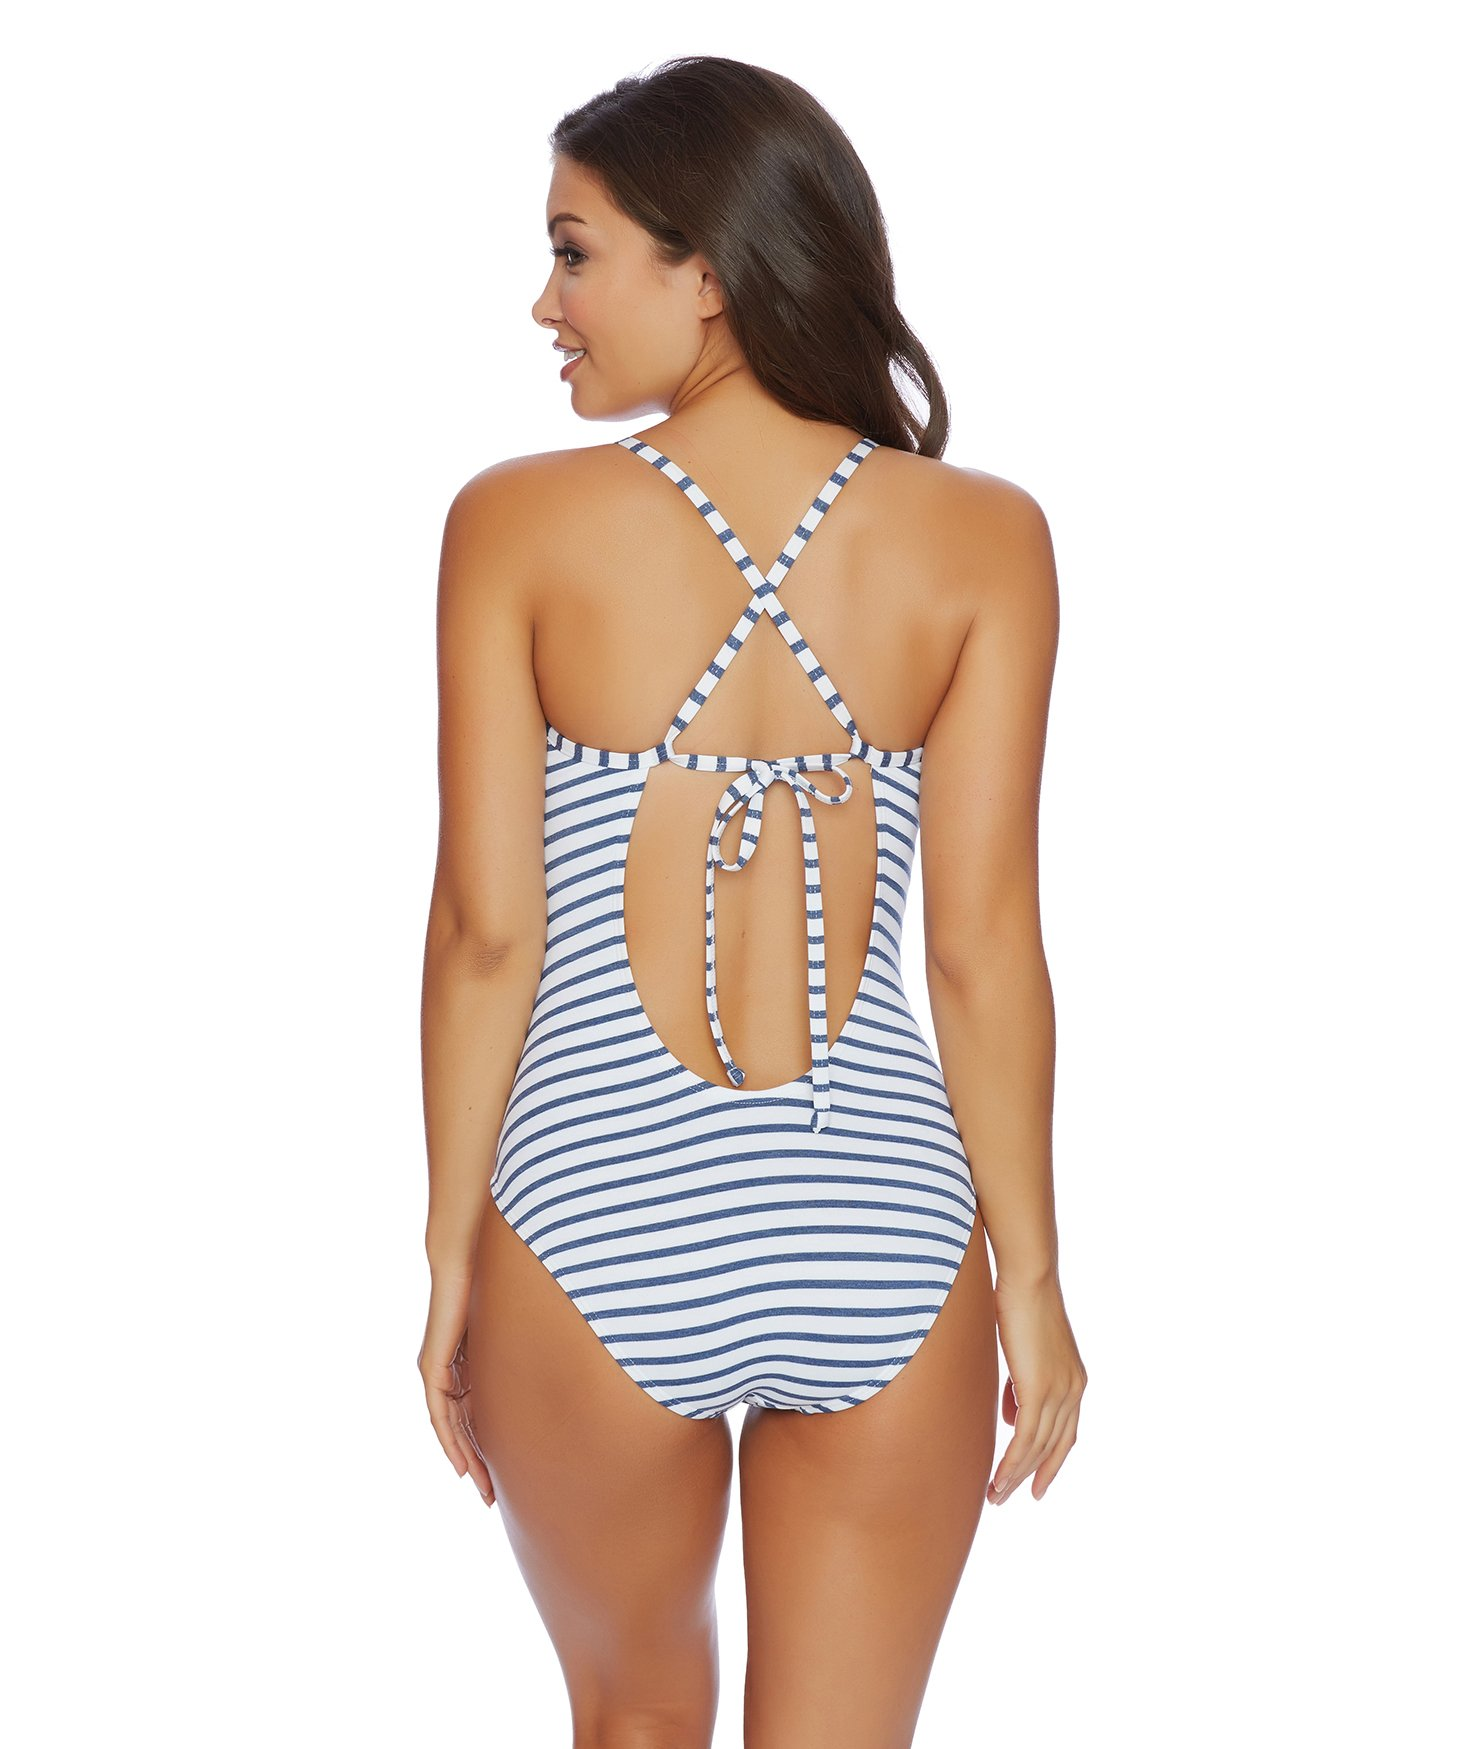 Splendid Women's Crisscross One Piece Swimsuit, Chambray All Day Blue, Medium by Splendid (Image #3)